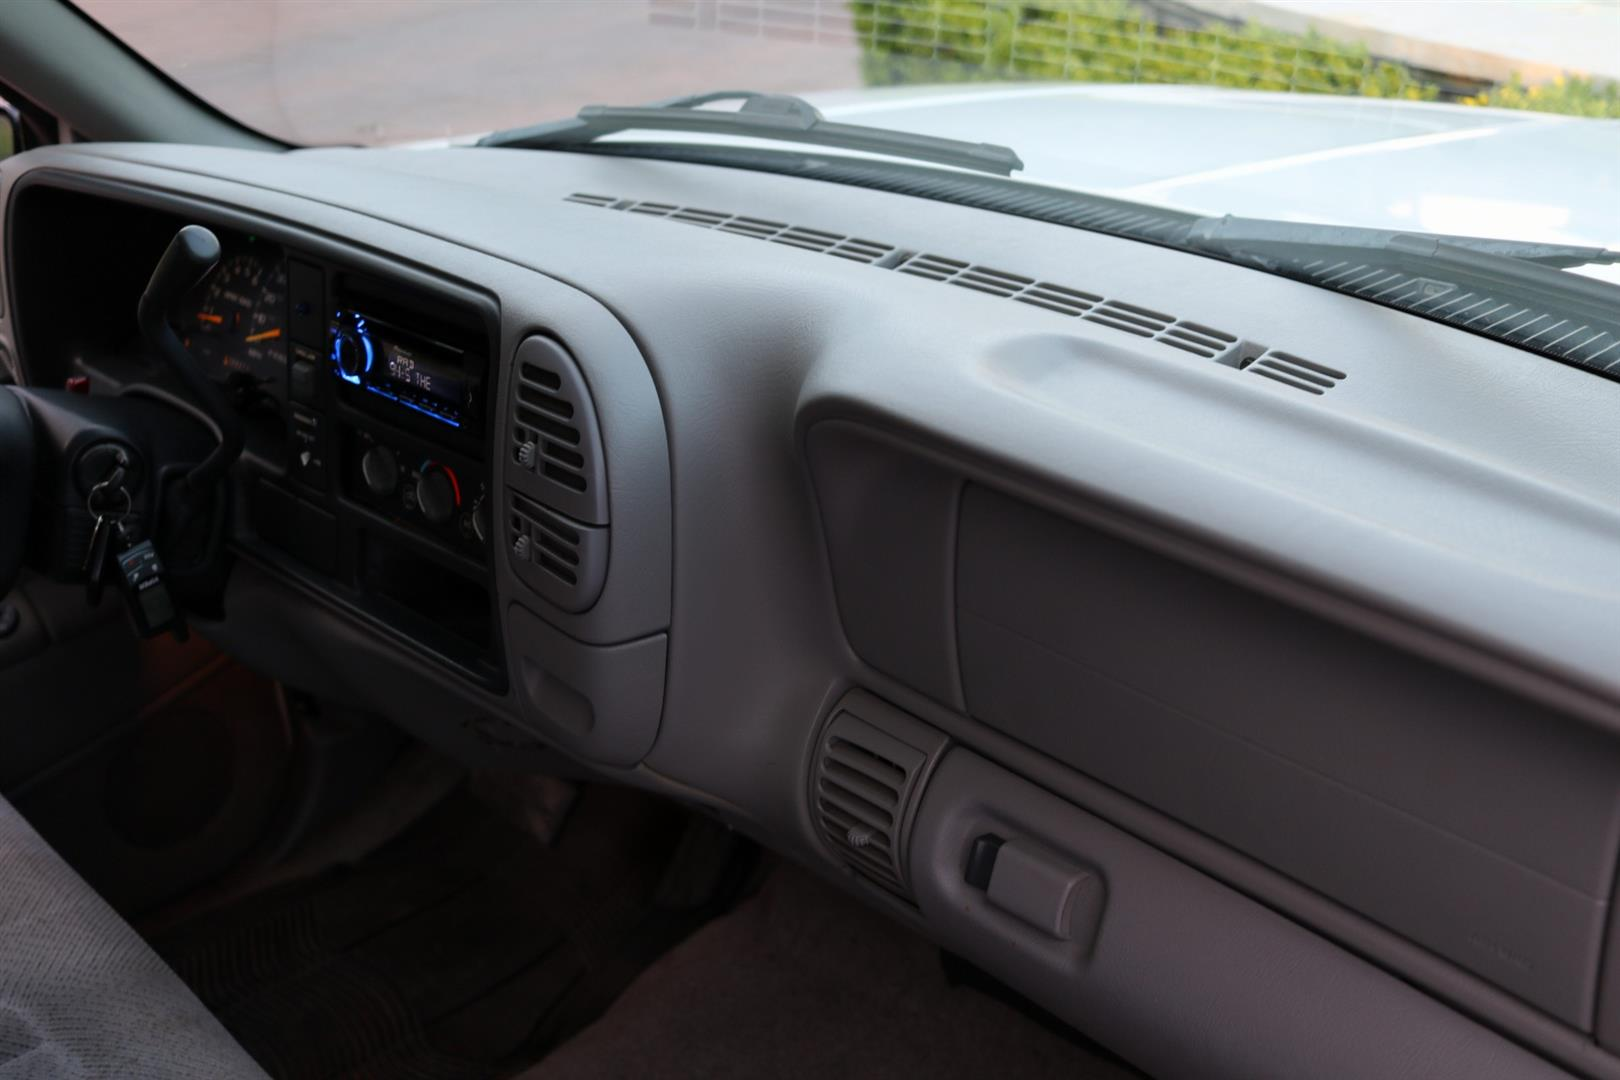 1998 GMC 1500 Sierra SLE Ex Cab – TEXAS TRUCKS & CLASSICS